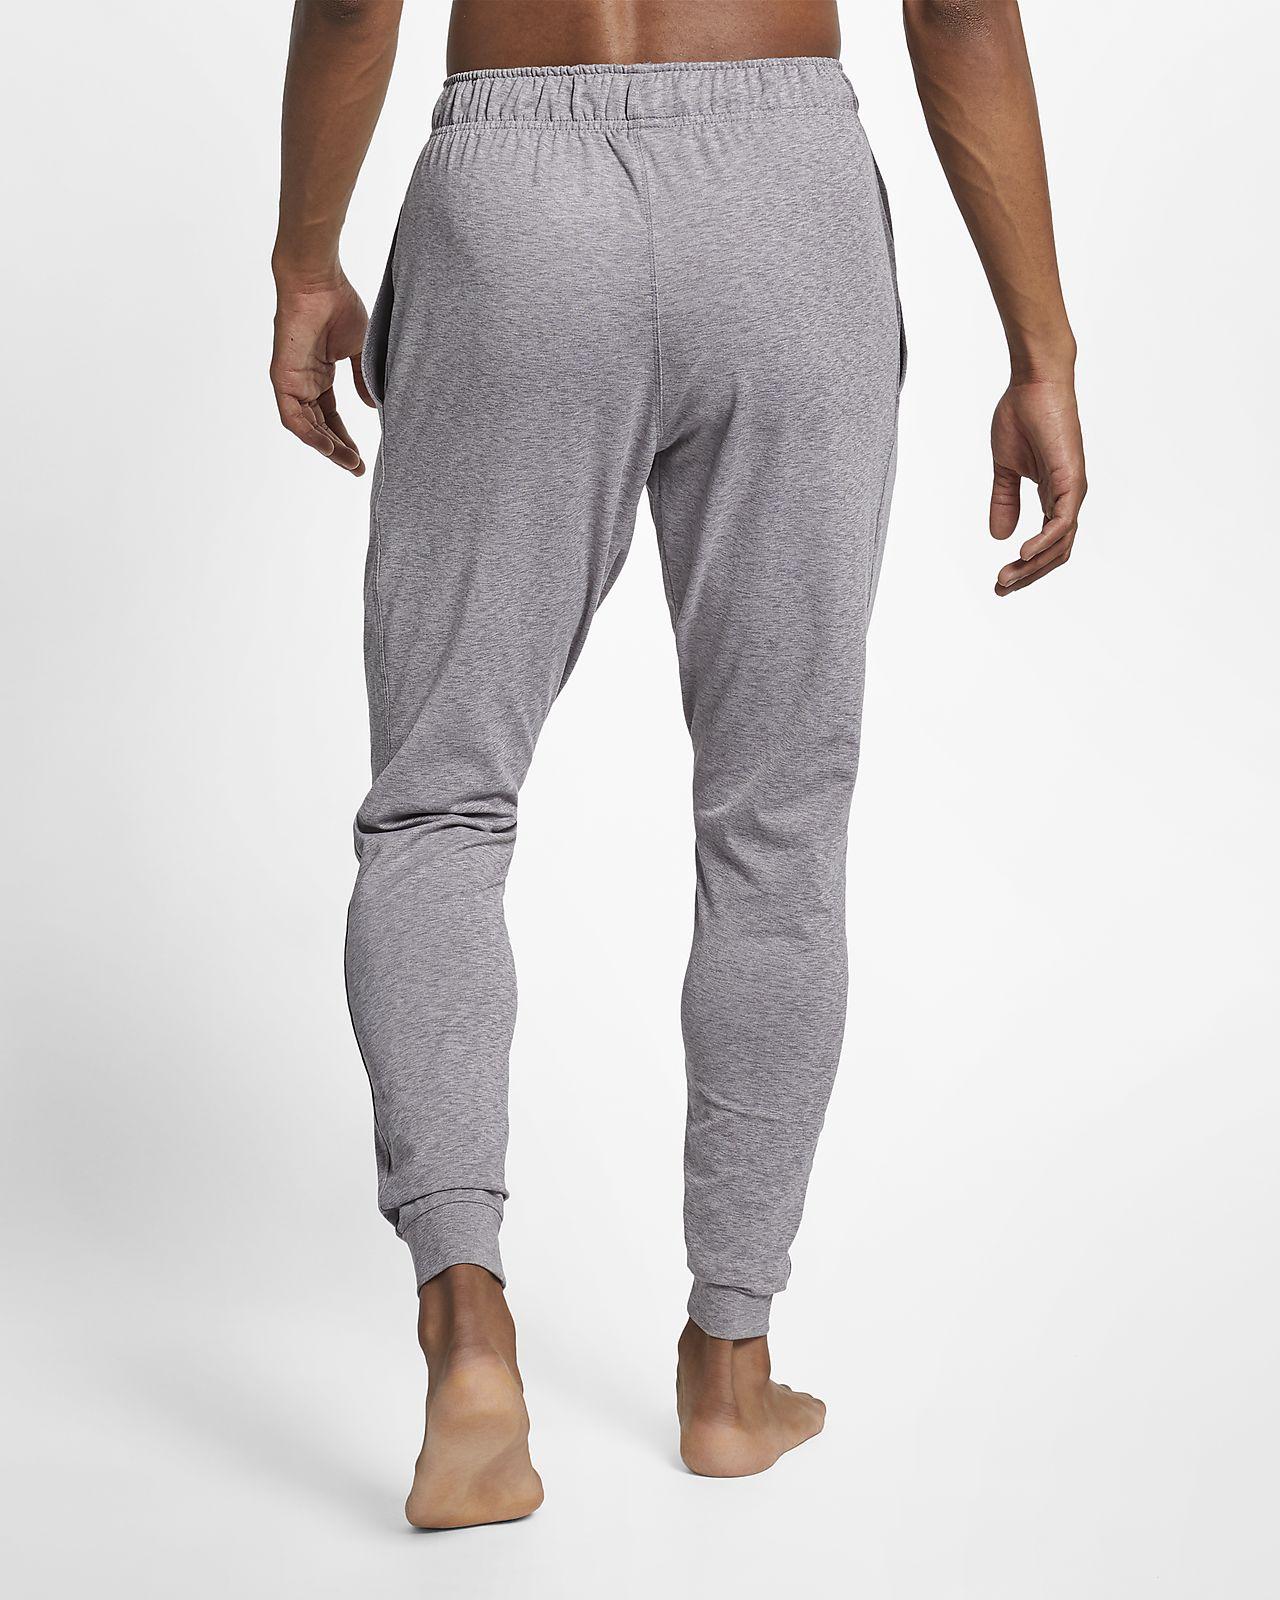 Nike Dri FIT Herren Yogahose